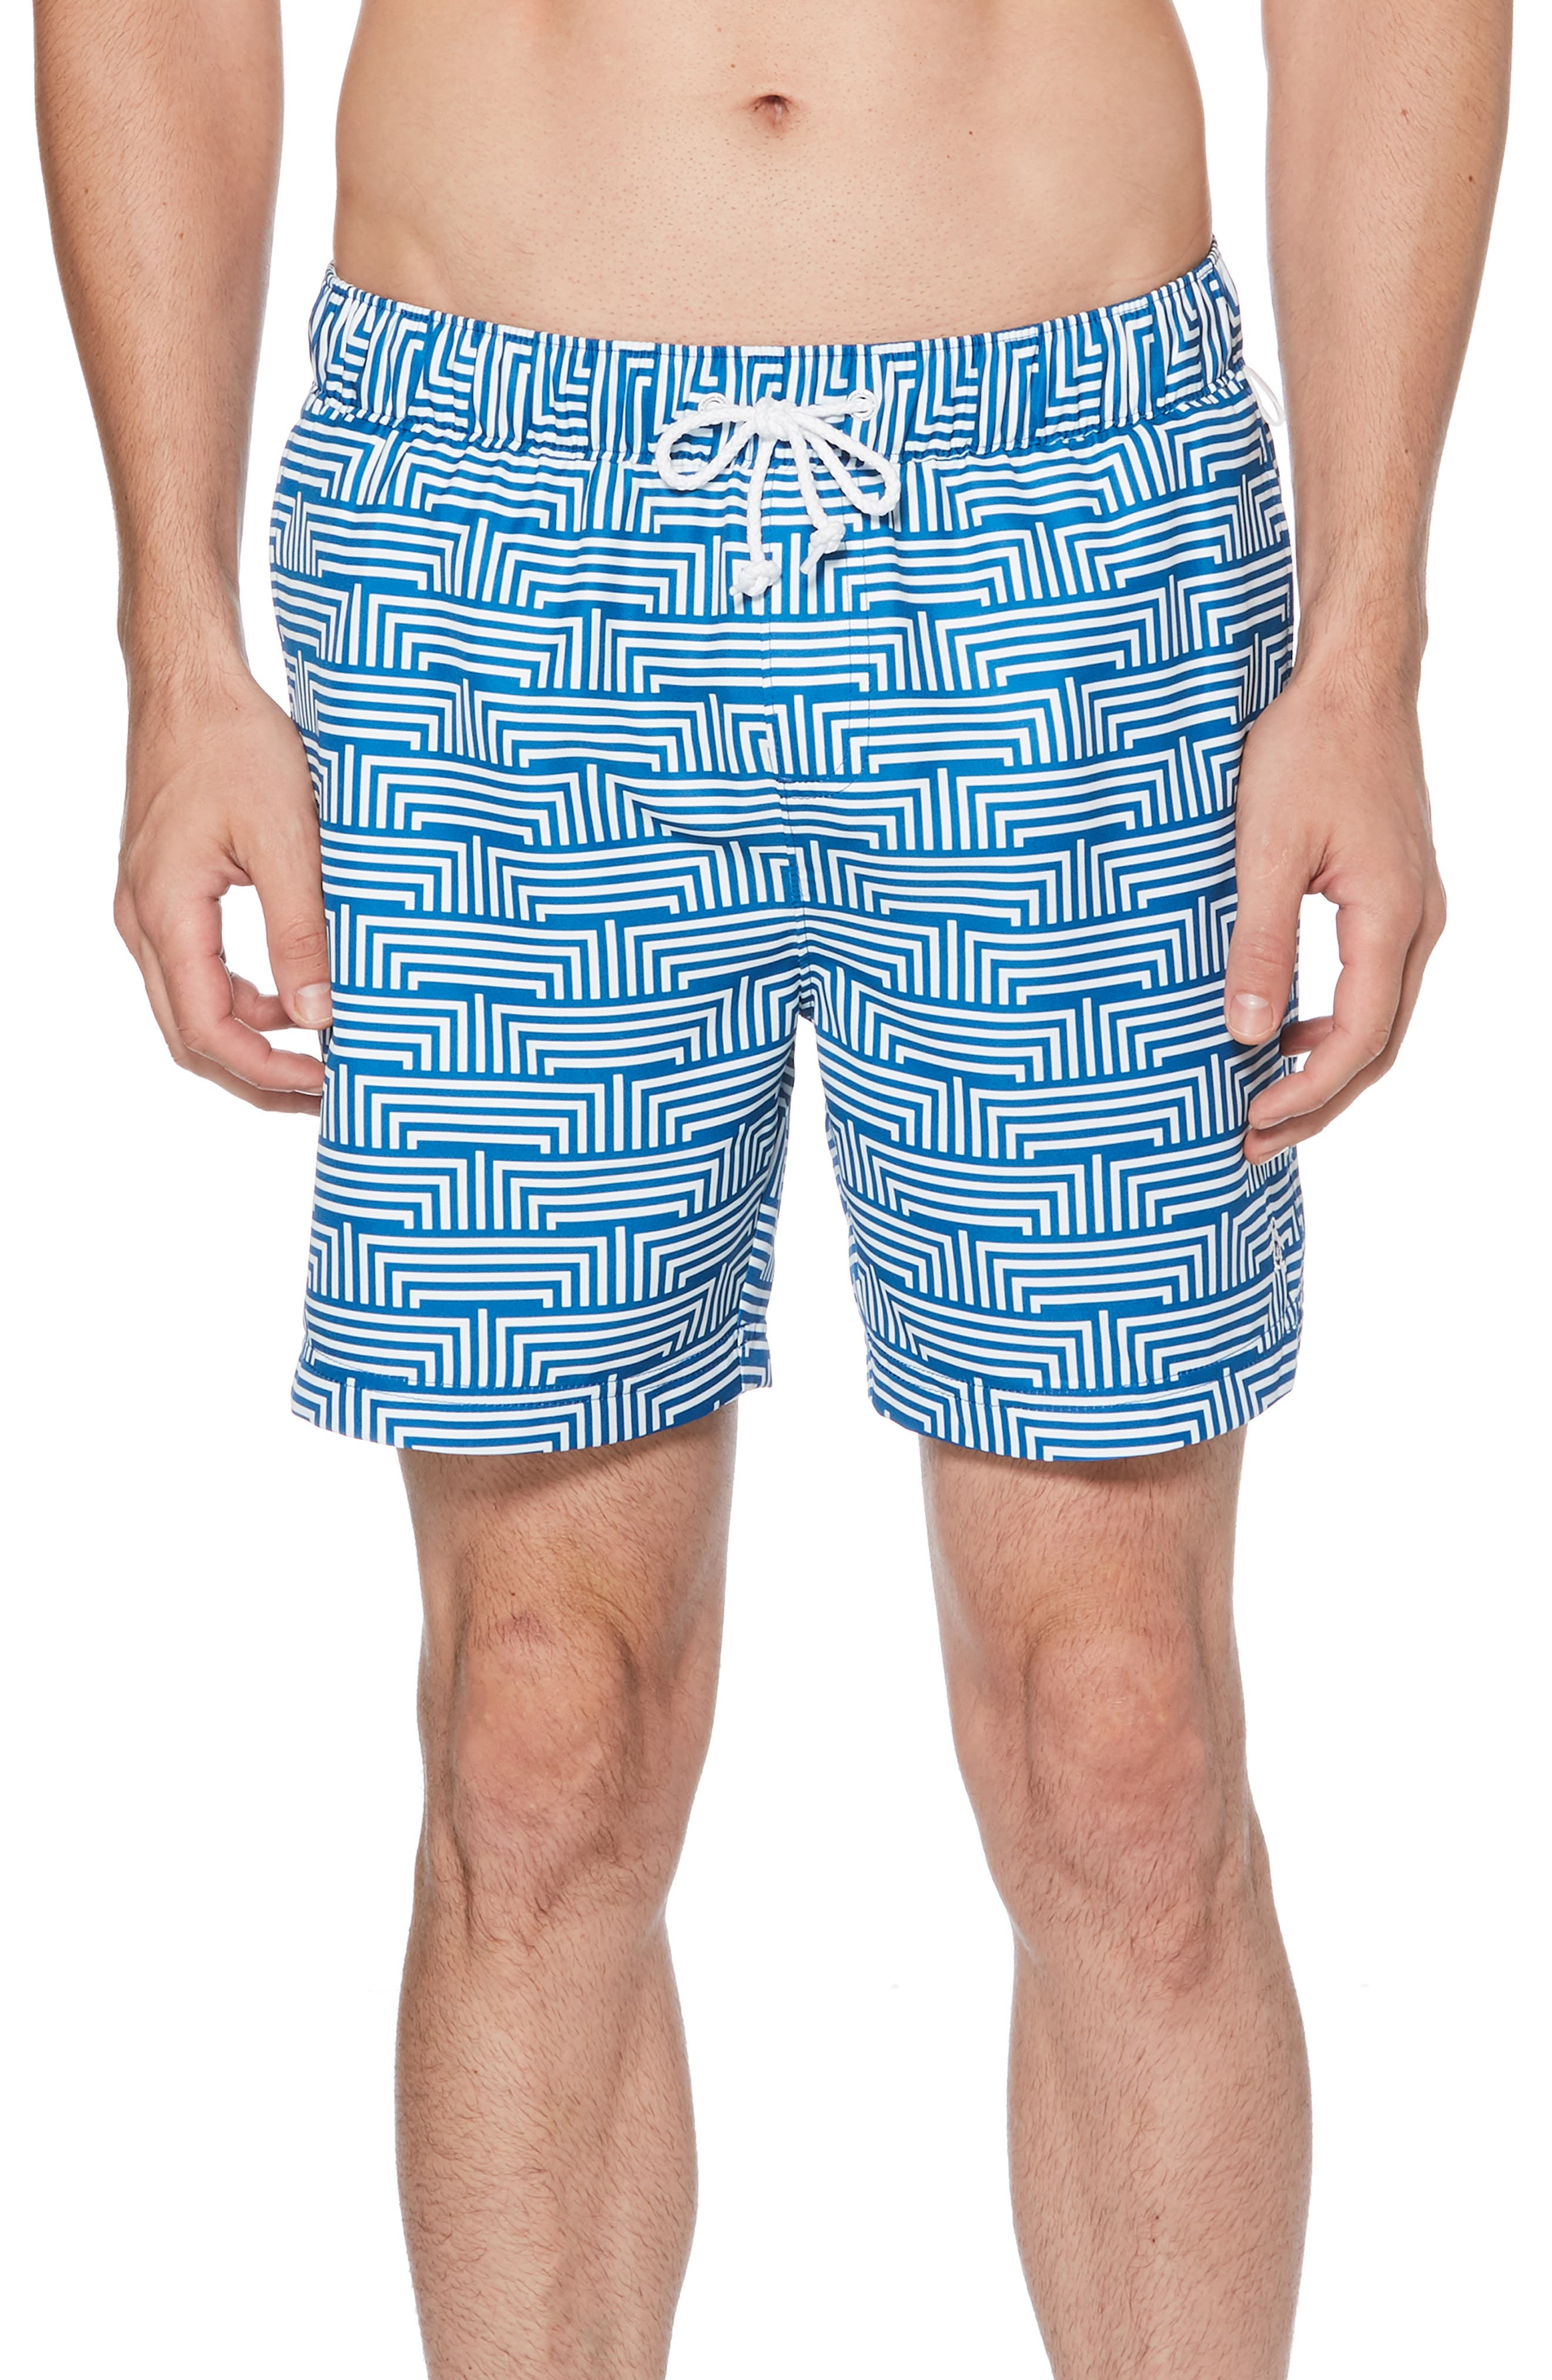 ORIGINAL PENGUIN, Geo Print Swim Trunks, Main thumbnail 1, color, CLASSIC BLUE